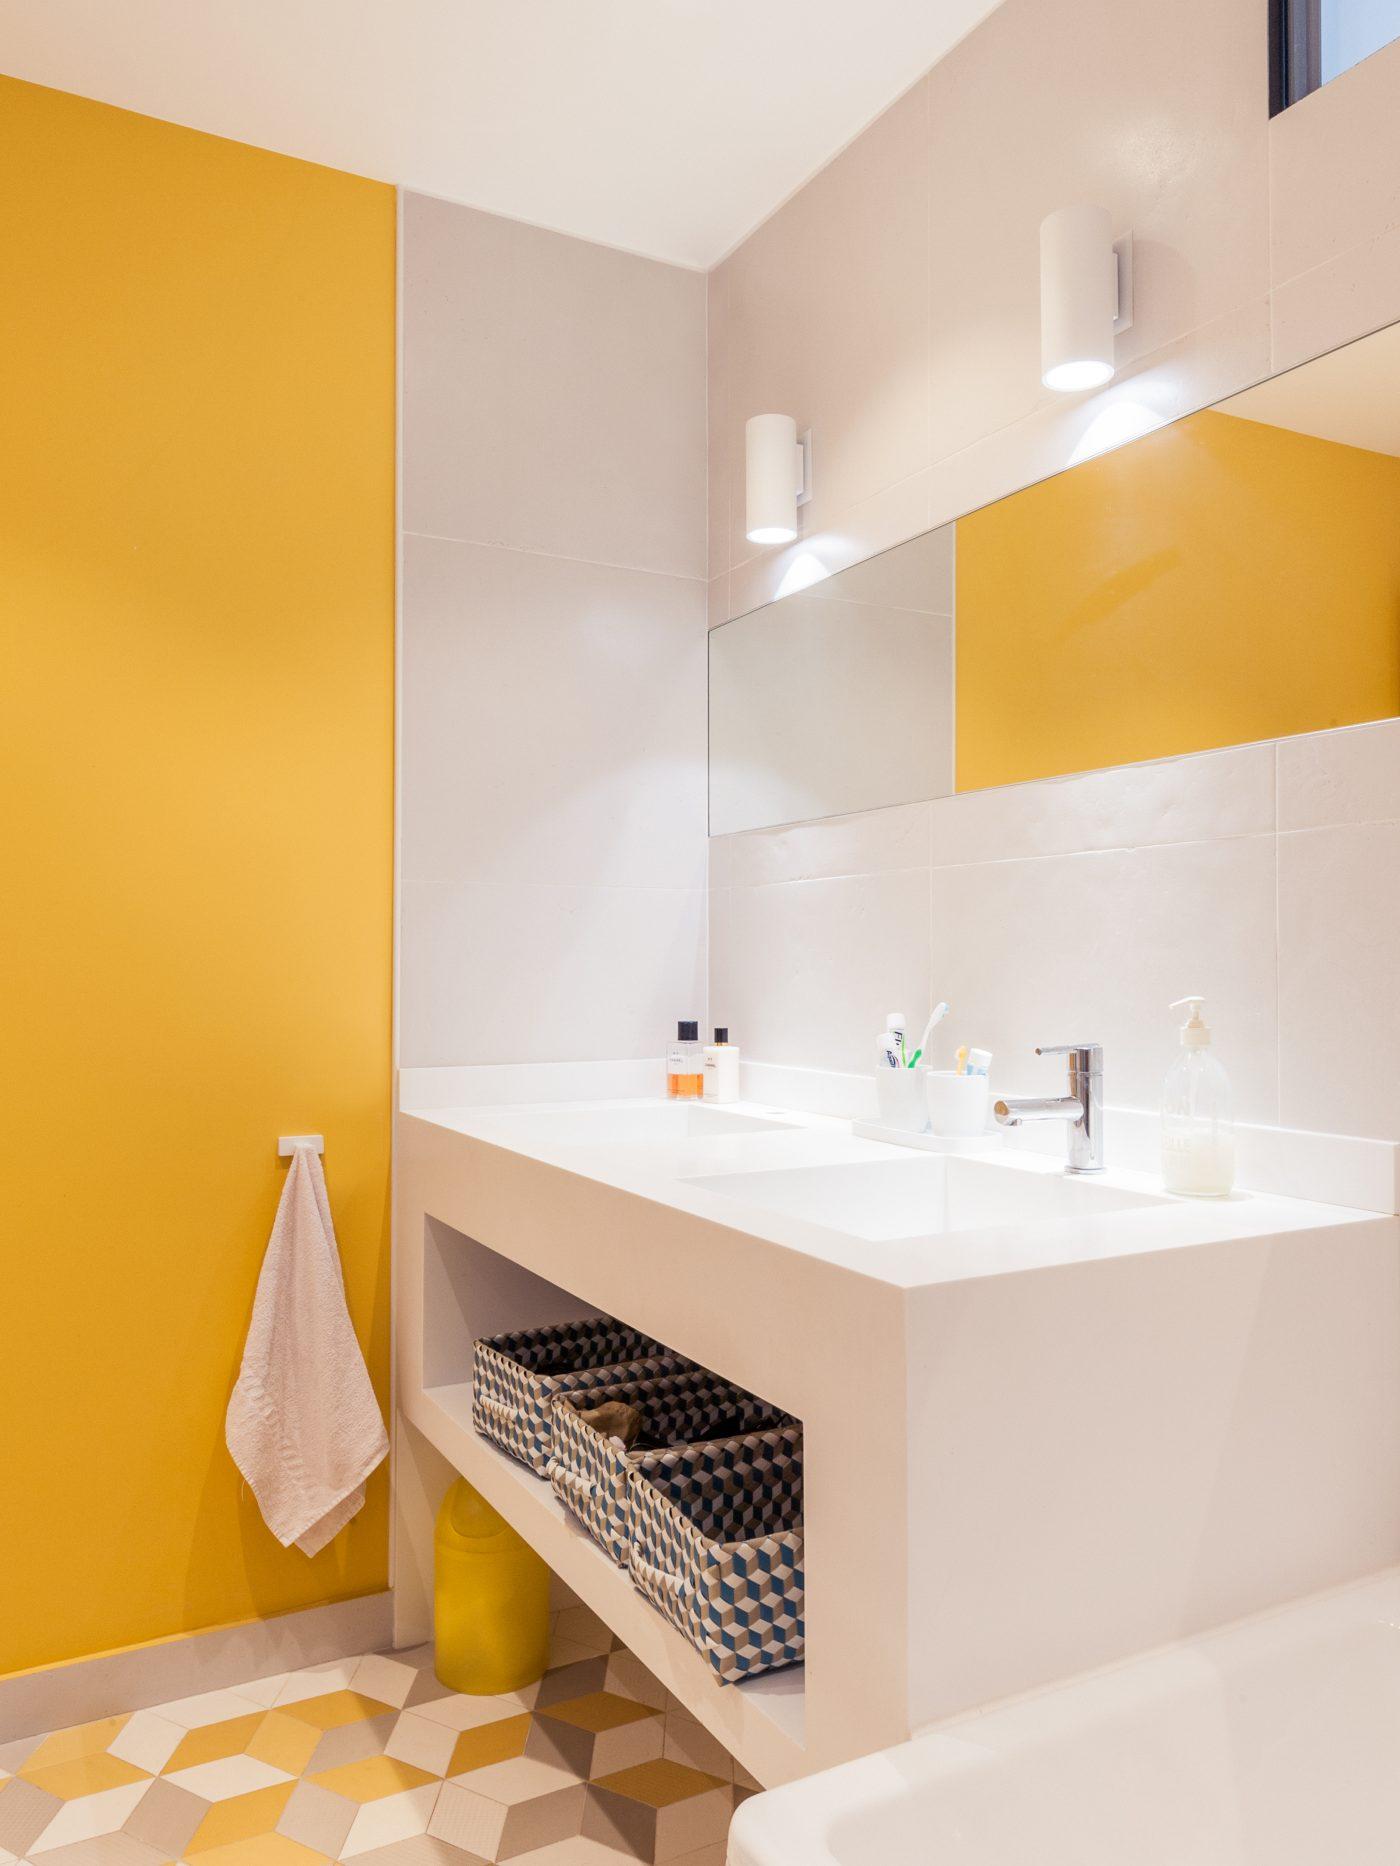 Moderne badkamer in grijs, wit en geel